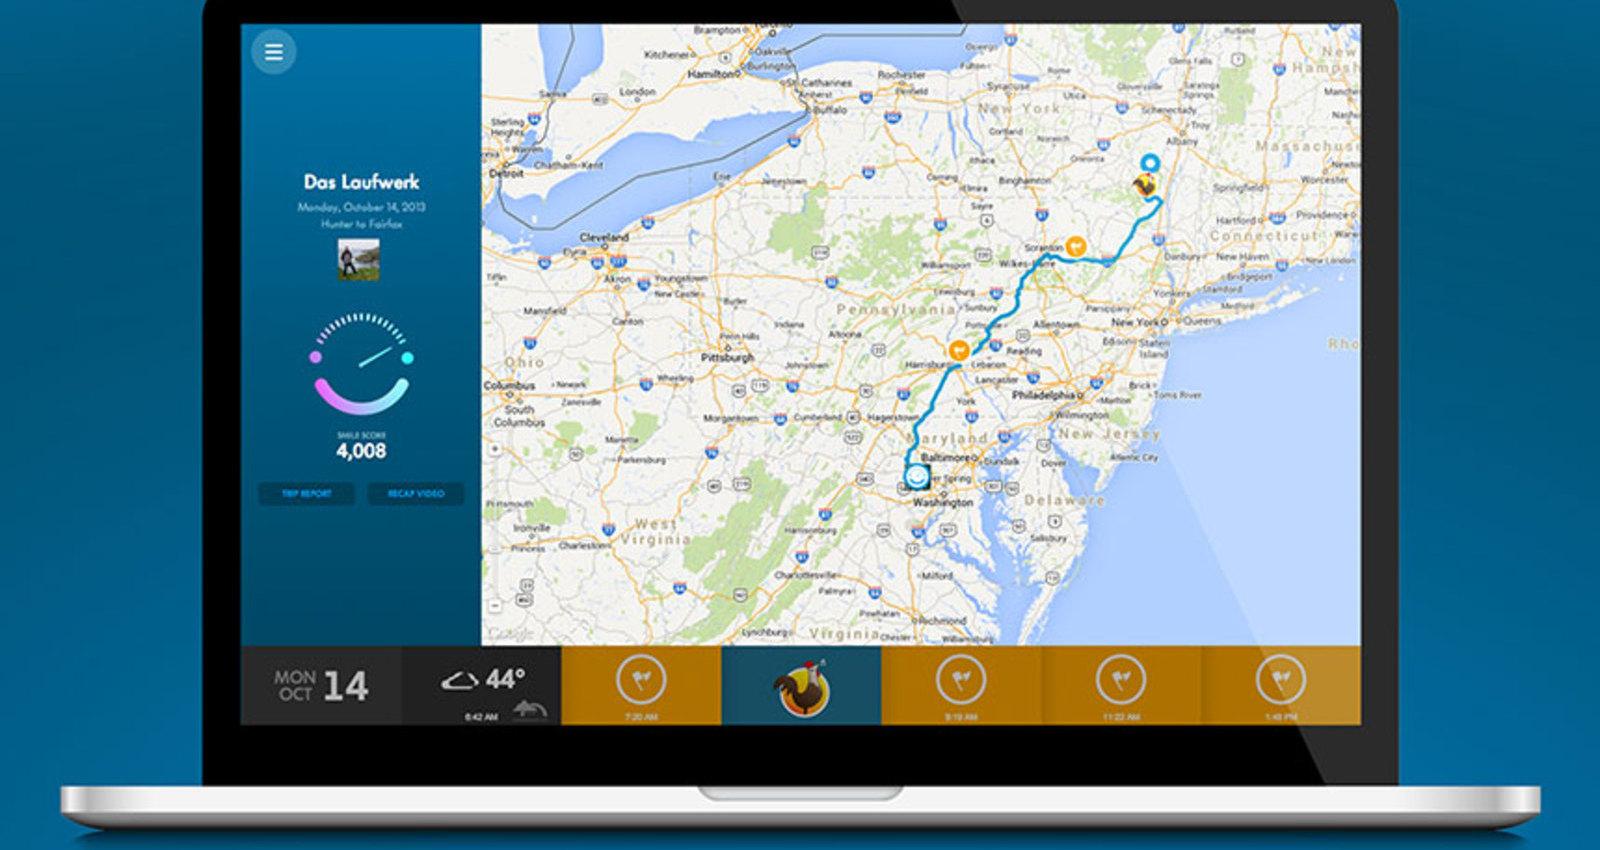 Volkswagen SmileDrive: A Google Art, Copy & Code Project